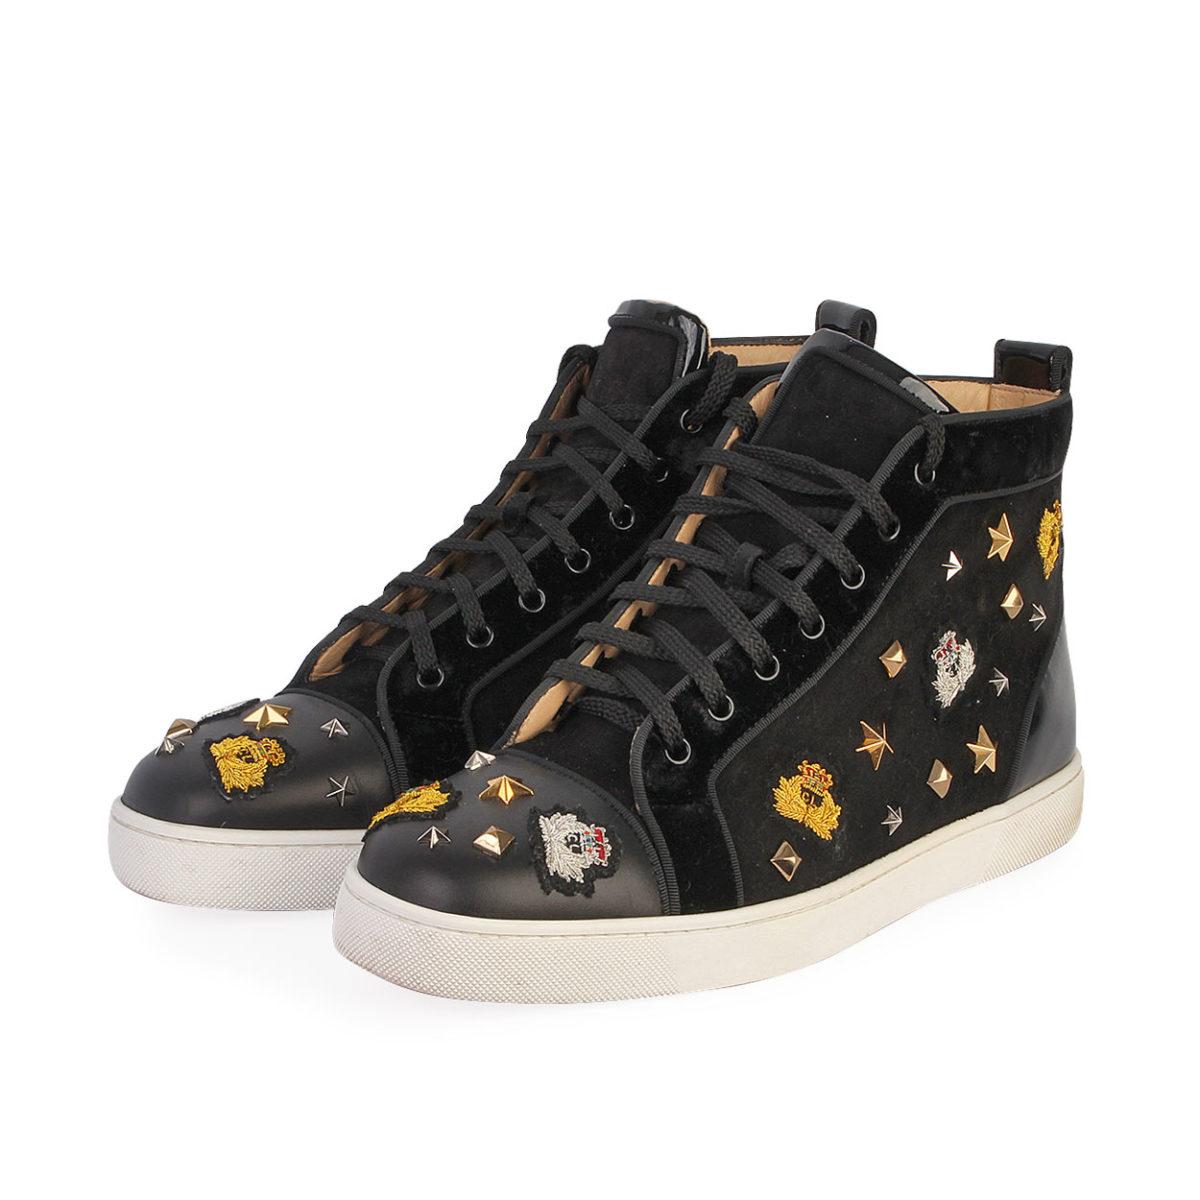 san francisco 7c3d4 23b79 CHRISTIAN LOUBOUTIN Velvet/Leather Studded Crest High Top Sneakers Black -  S: 43.5 (9)